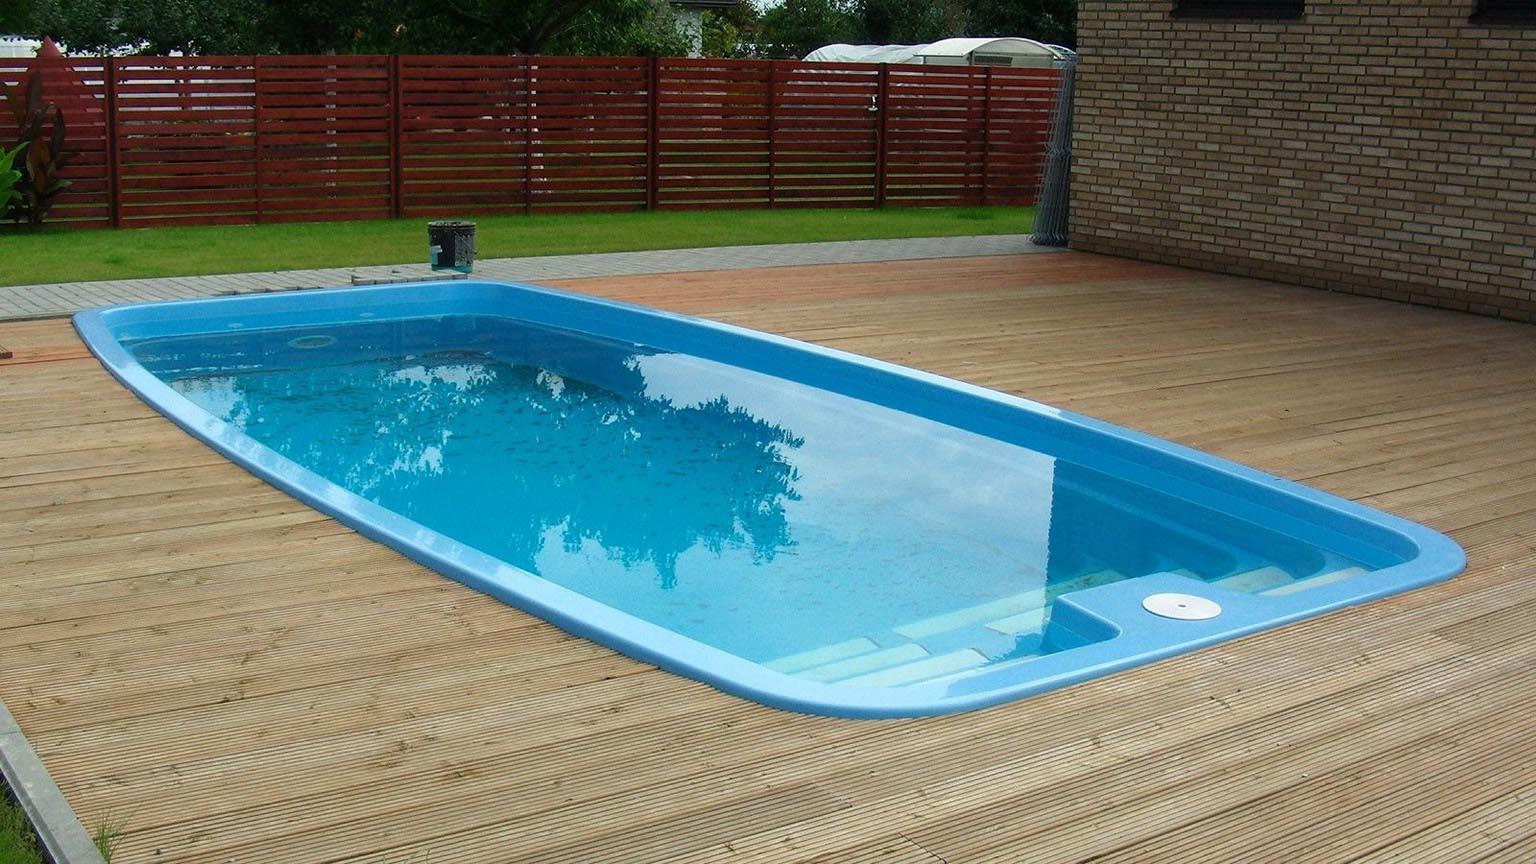 mini swimming pool pictures photo - 3